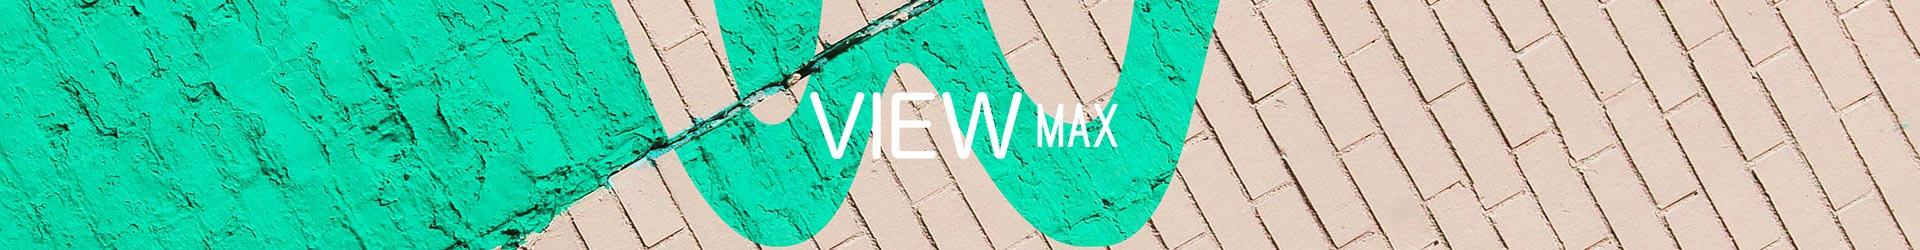 Smartphone View Max